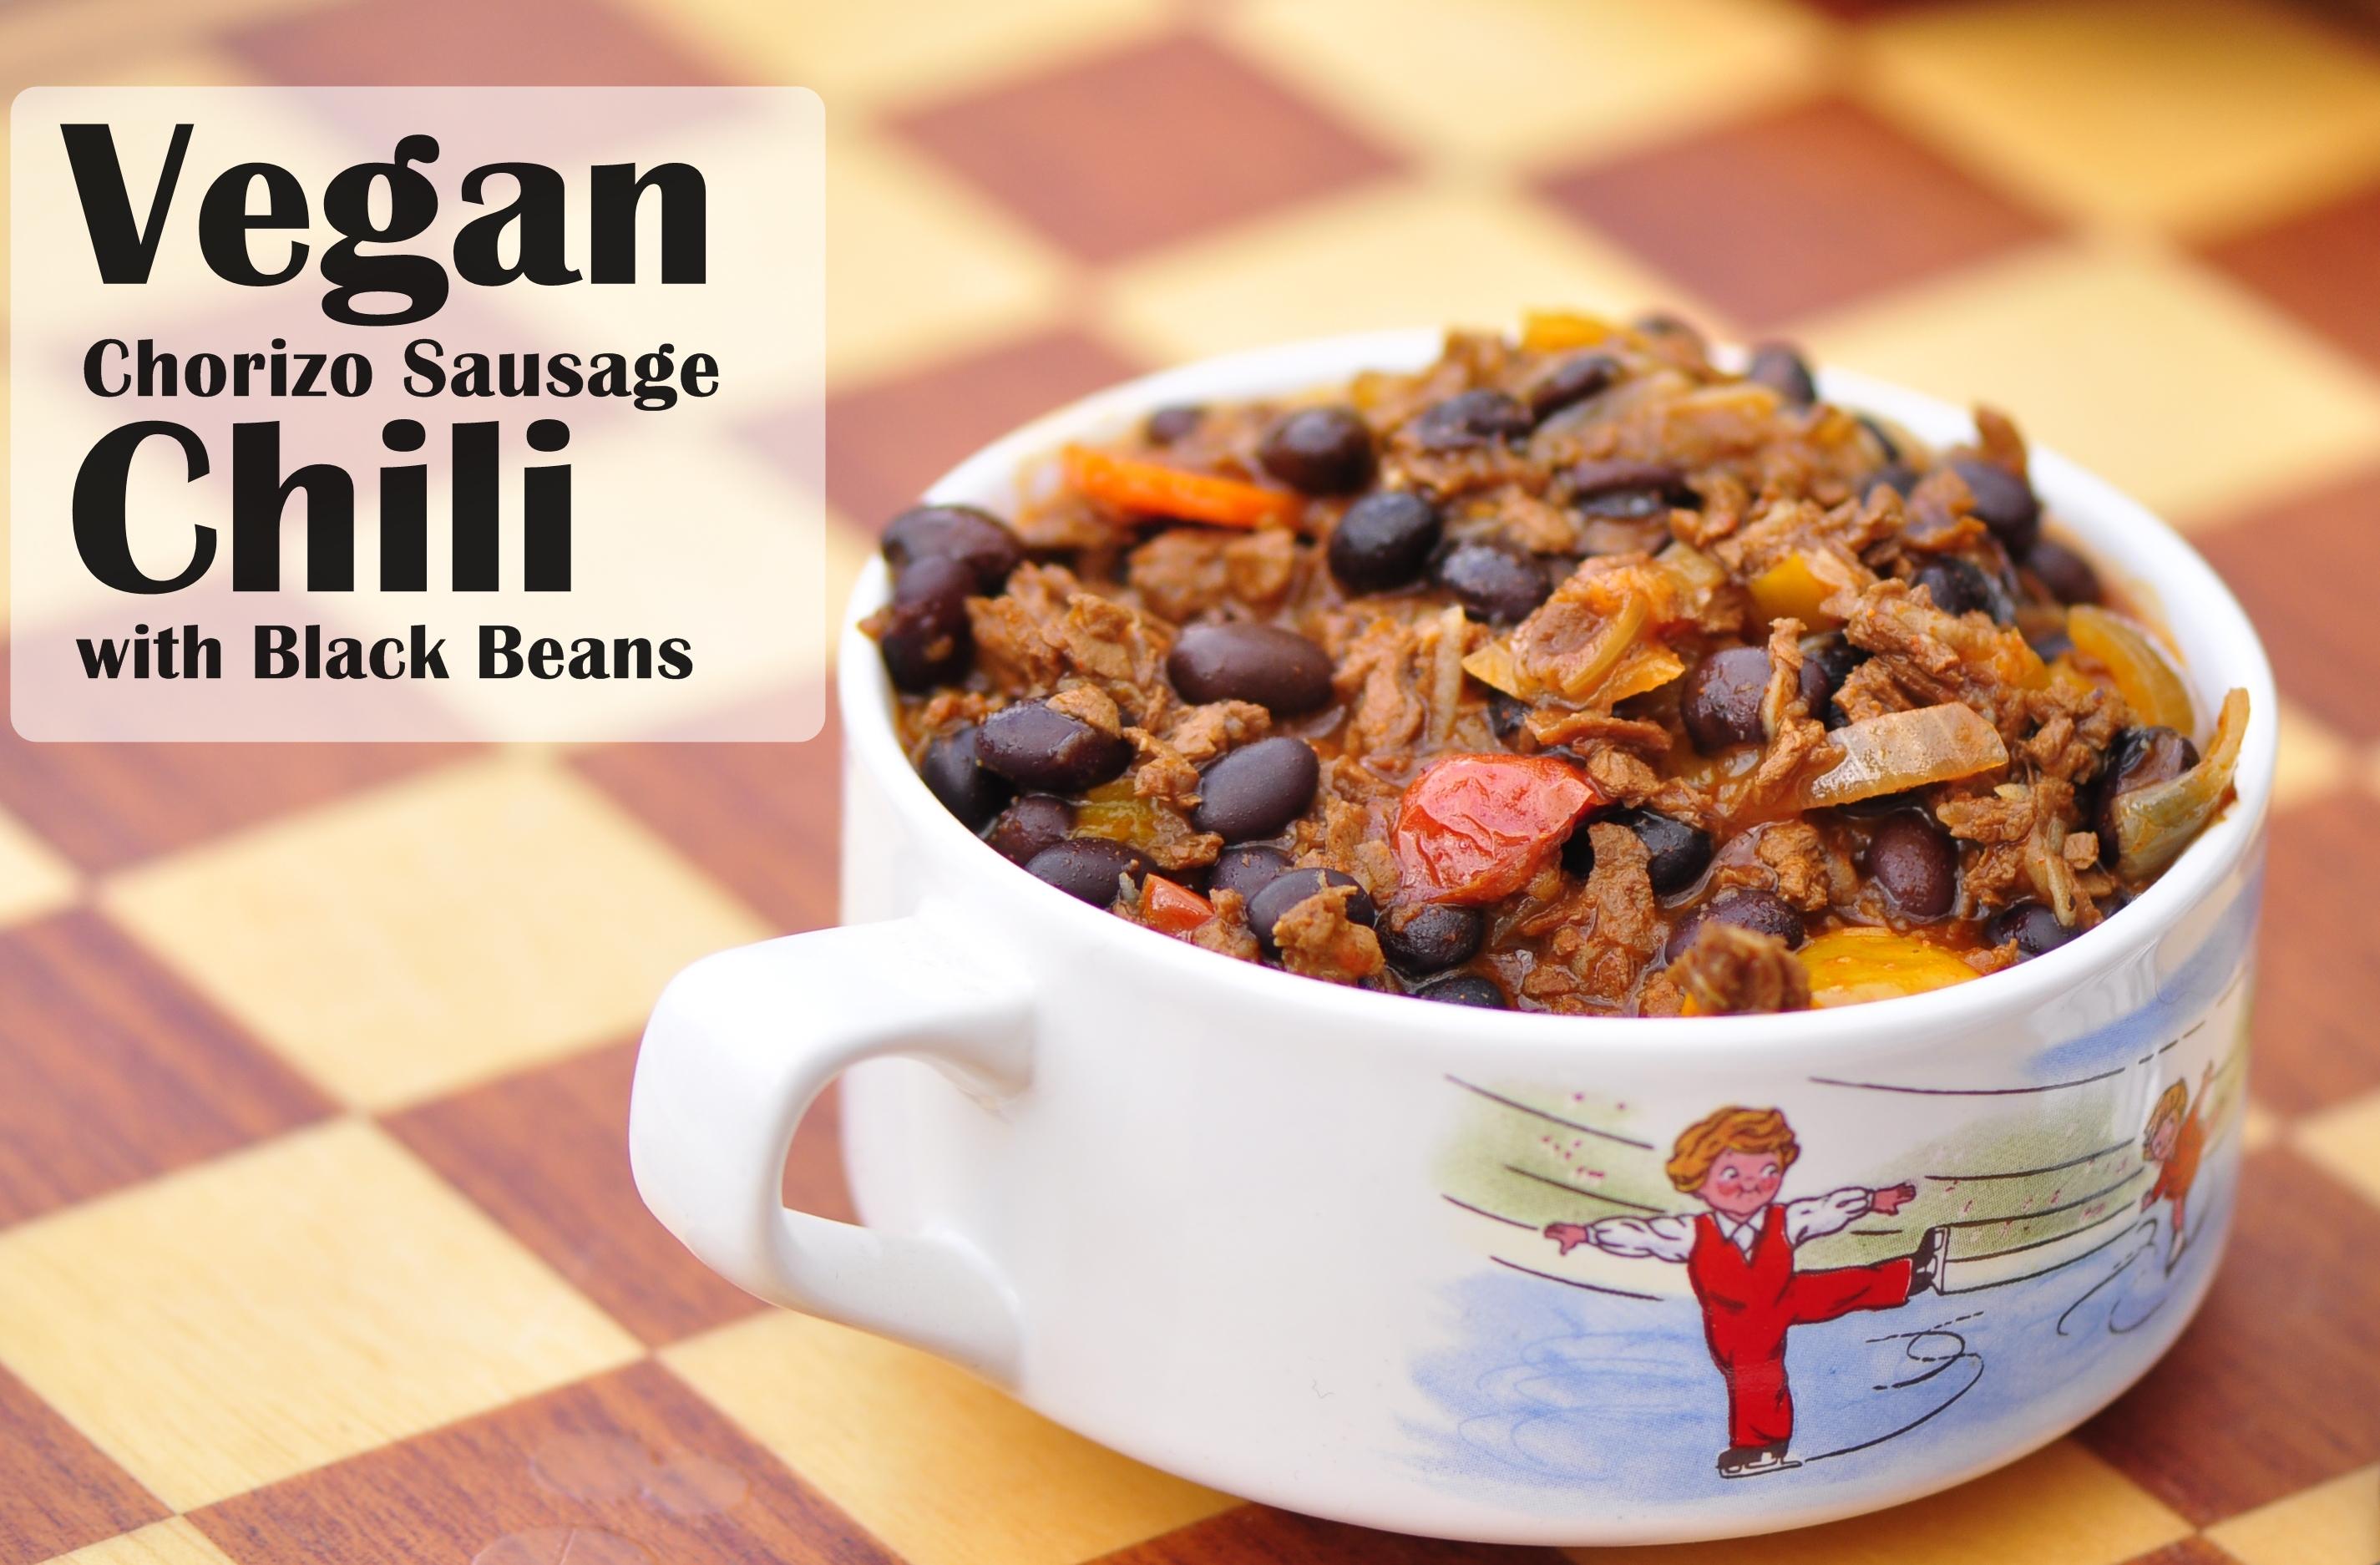 Vegan Chorizo Sausage Chili with Black Beansthe vegetarian ginger